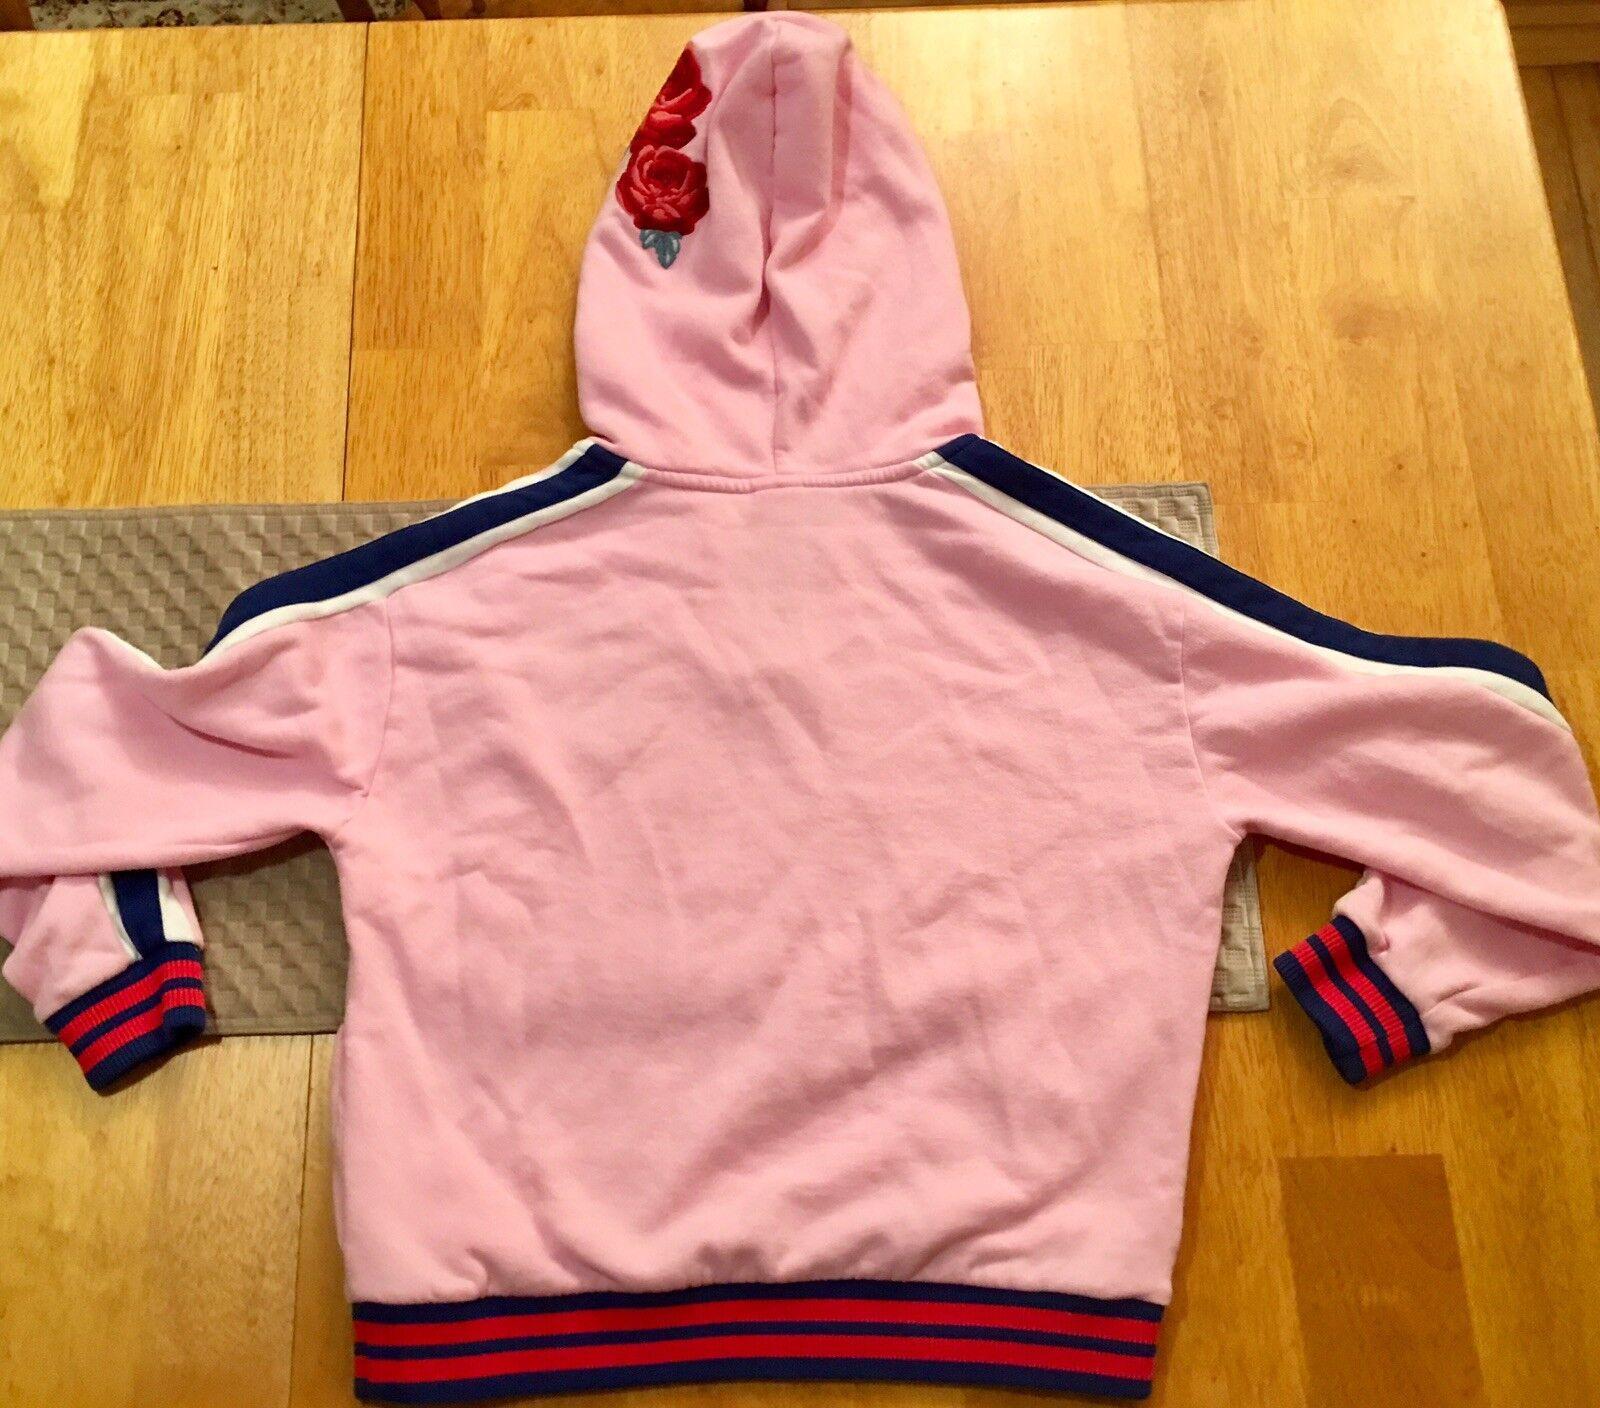 Victoria's Secret Pink pinks Embroidered Campus Campus Campus Crew Sweatshirt Hoodie S Small 582228